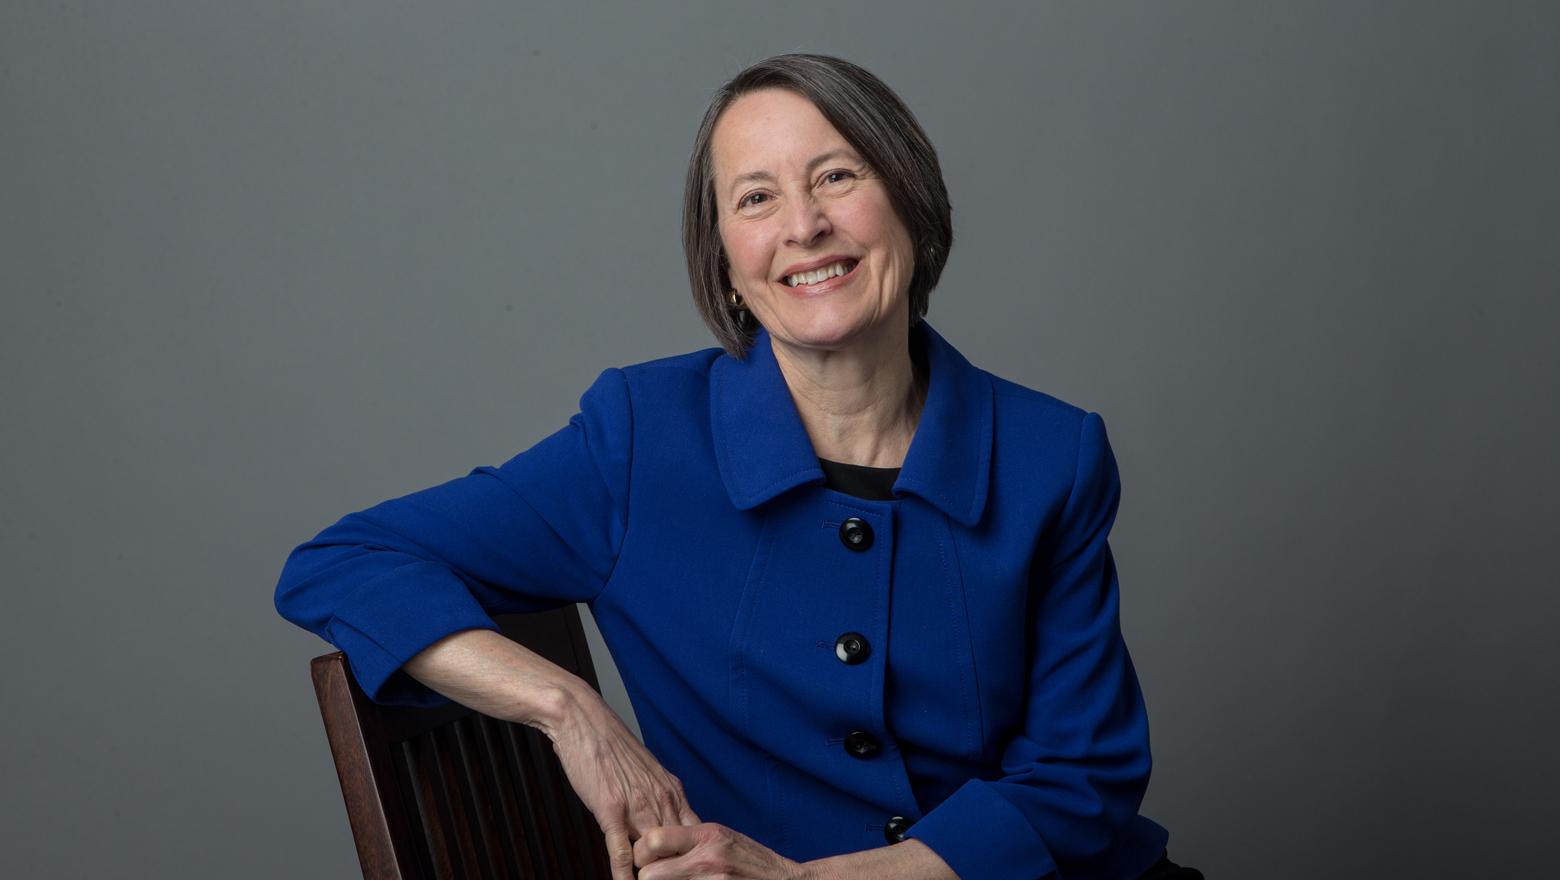 Carol Pauli